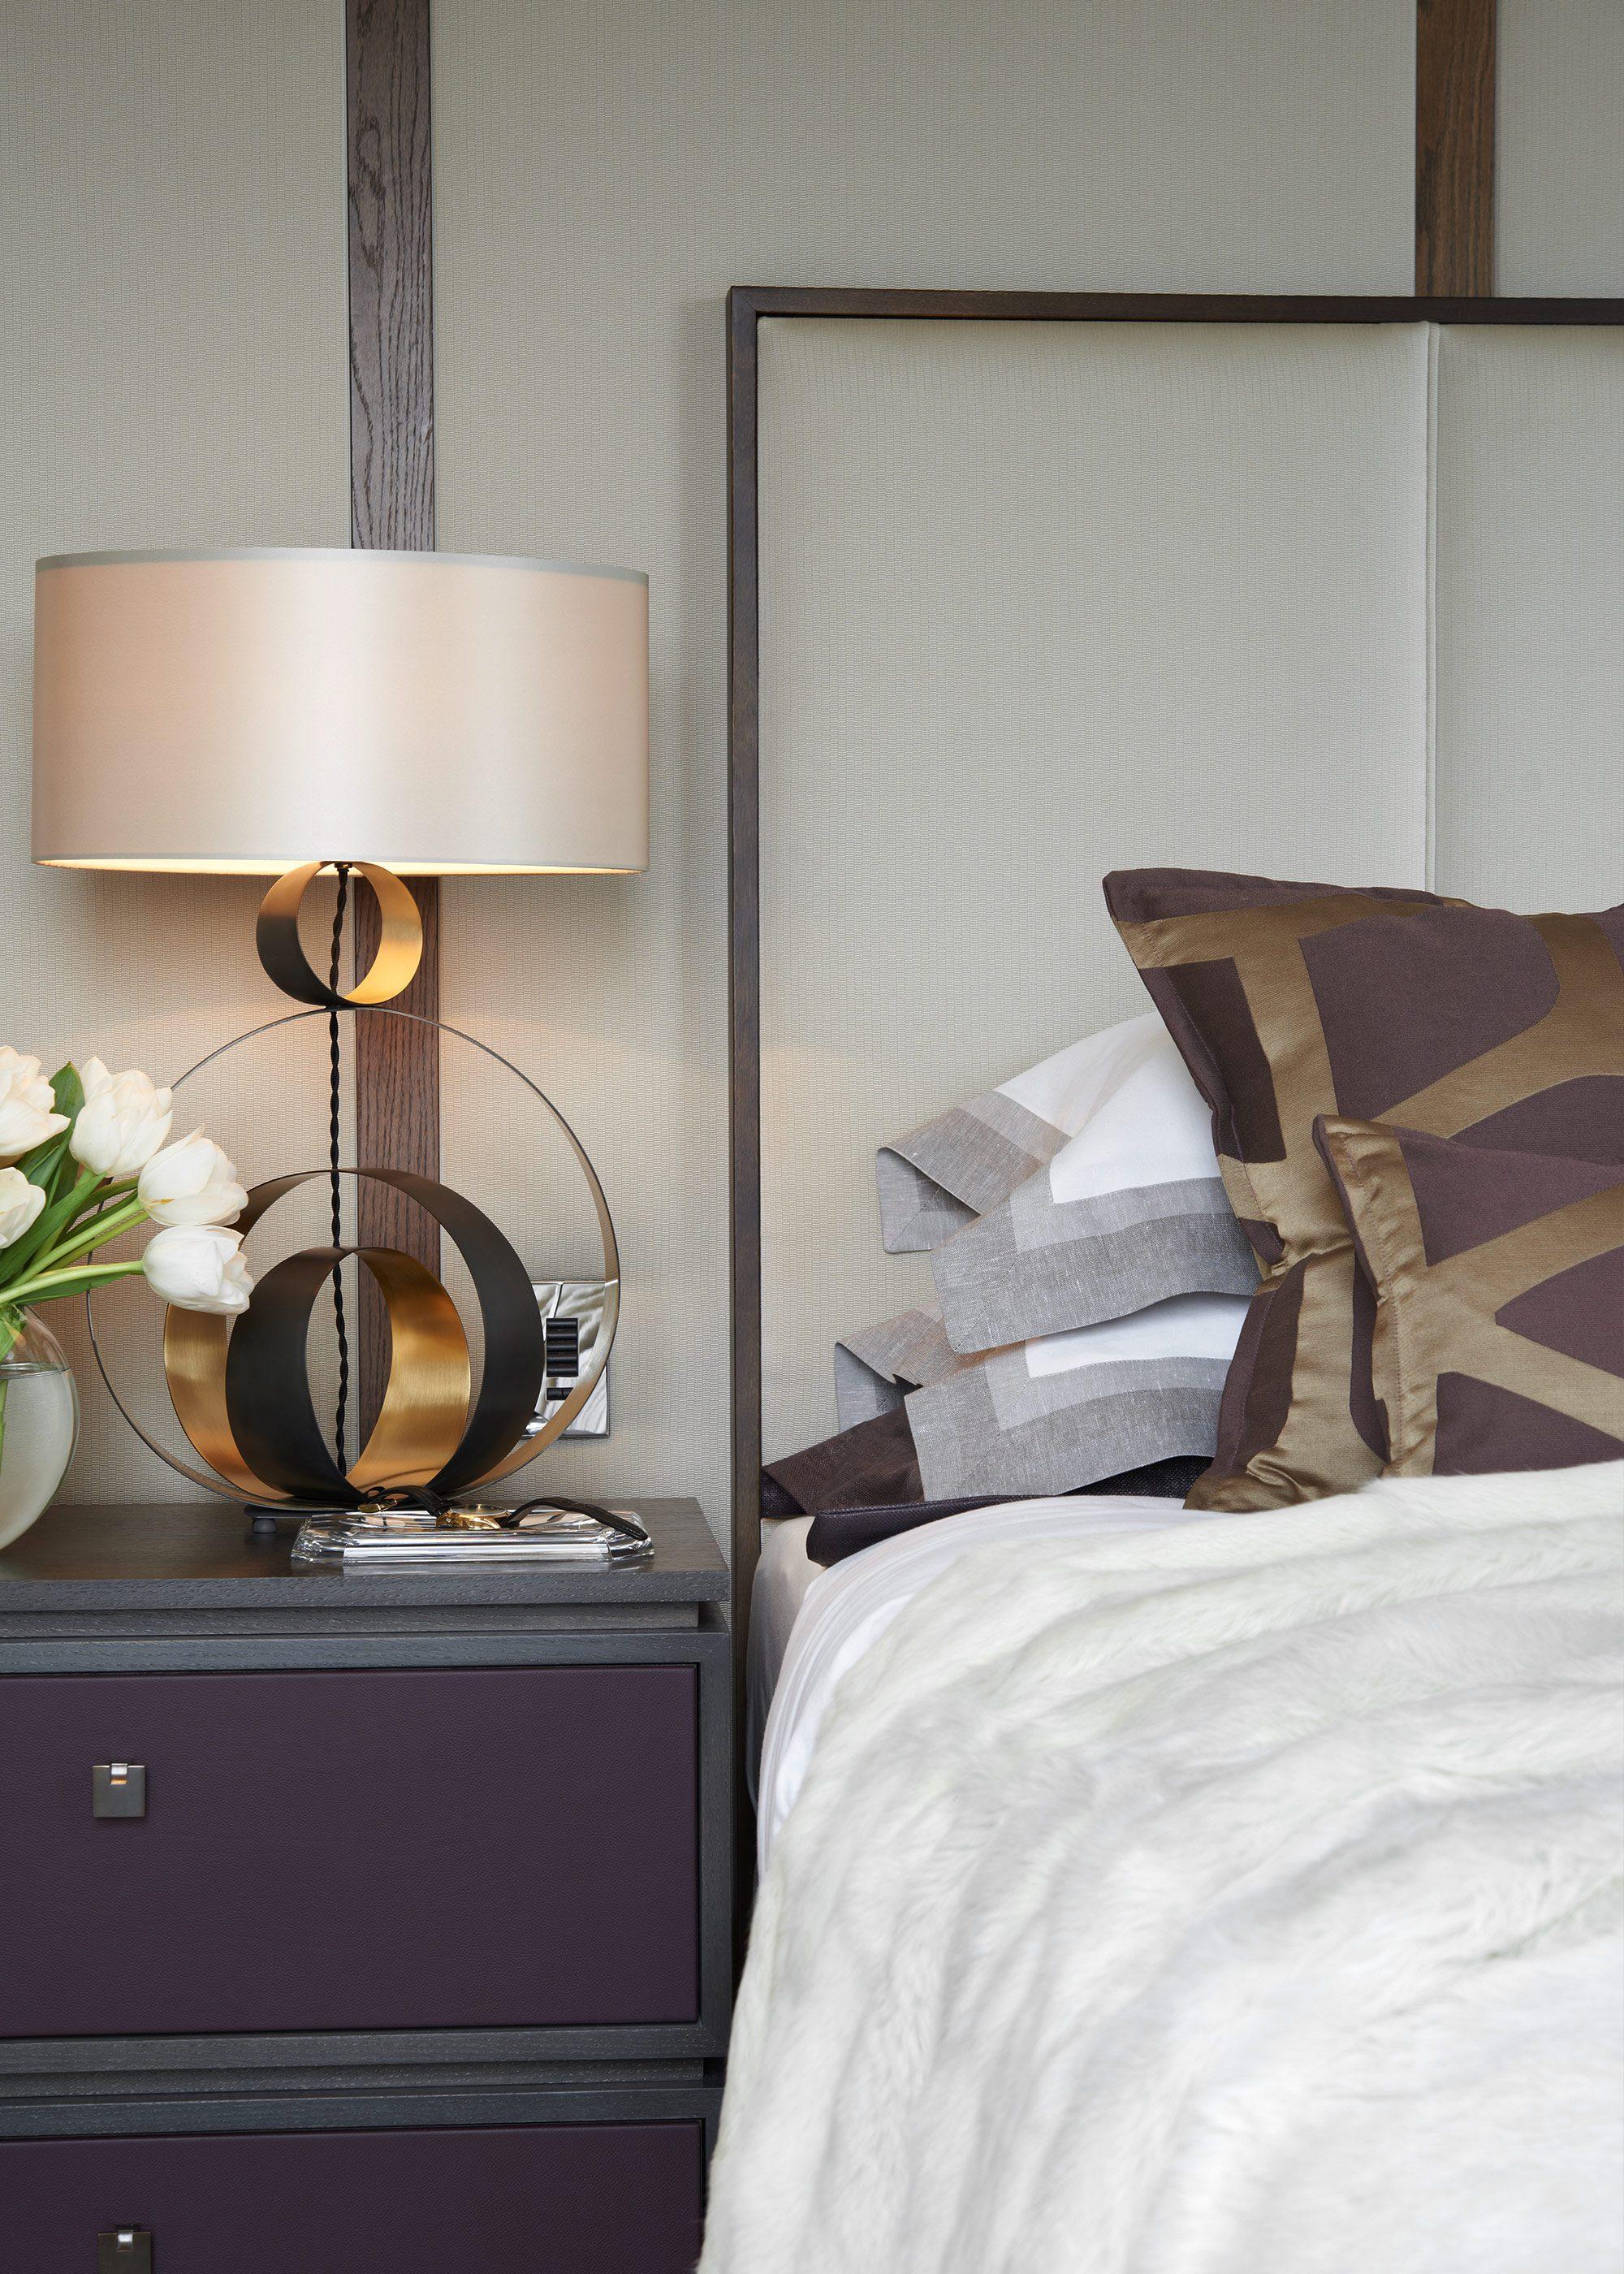 Honky Interior Design Trafalgar Square London Bedroom Detail